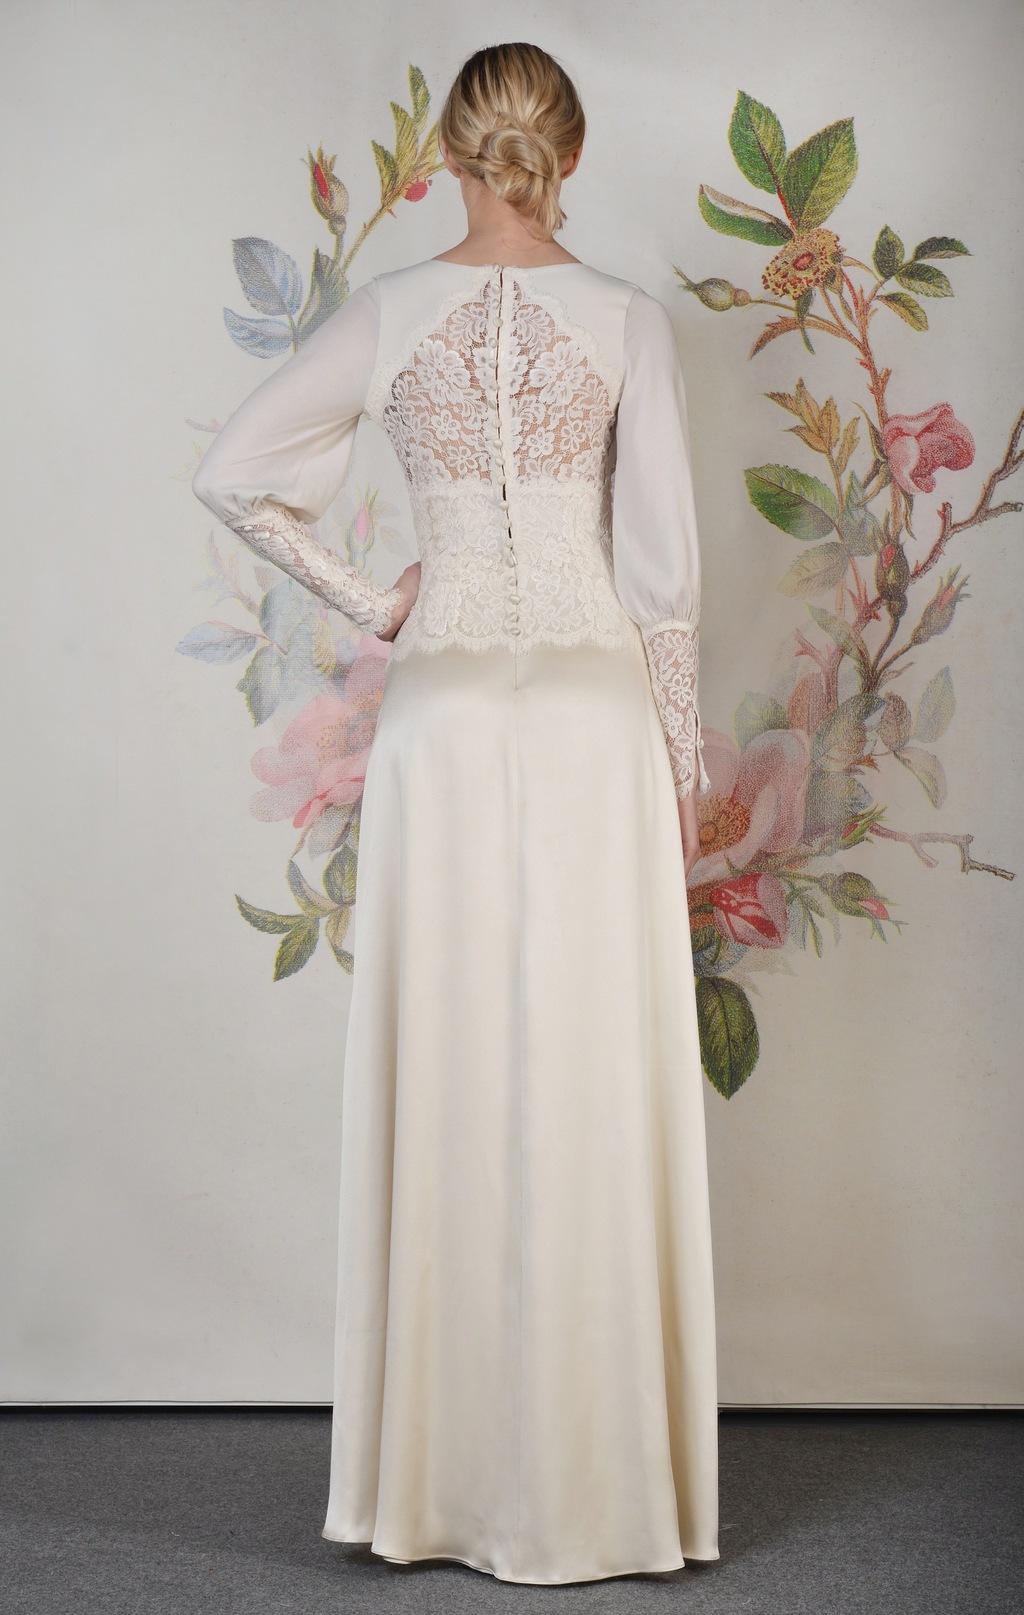 Claire-pettibone-spring-summer-2014-wedding-dress-estelle_b_02.full